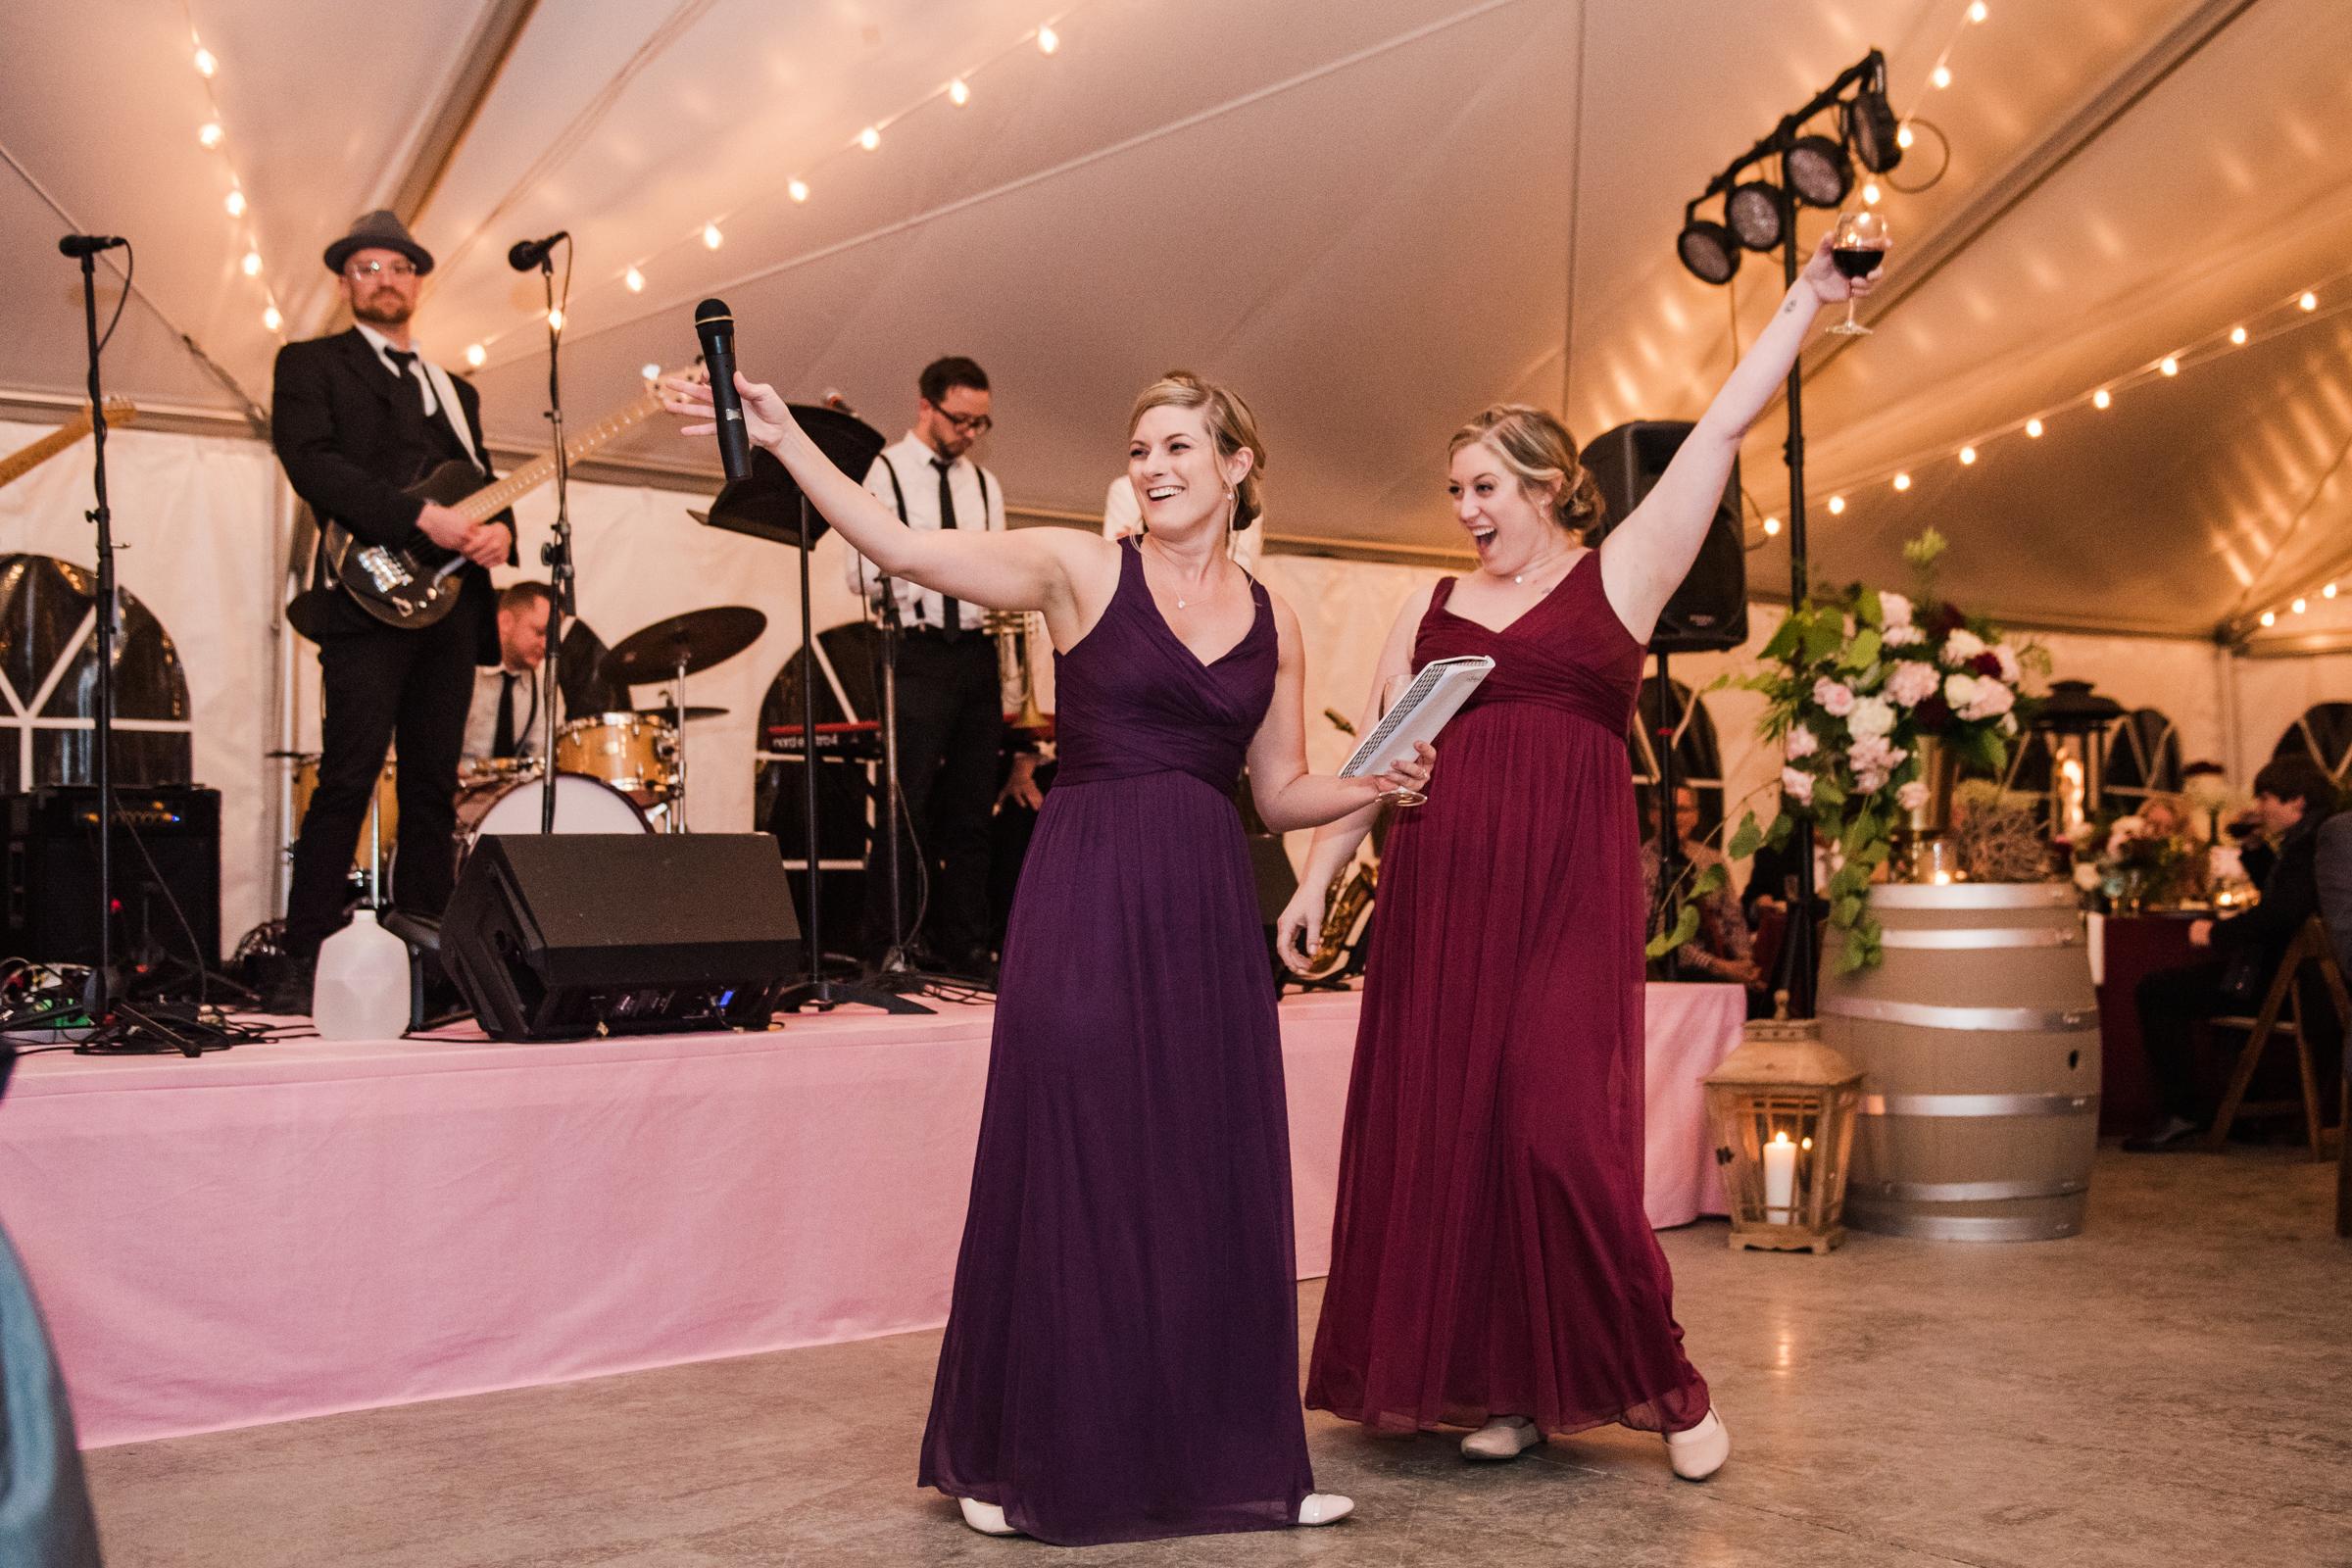 Zugibe_Vineyards_Finger_Lakes_Wedding_JILL_STUDIO_Rochester_NY_Photographer_DSC_4410.jpg